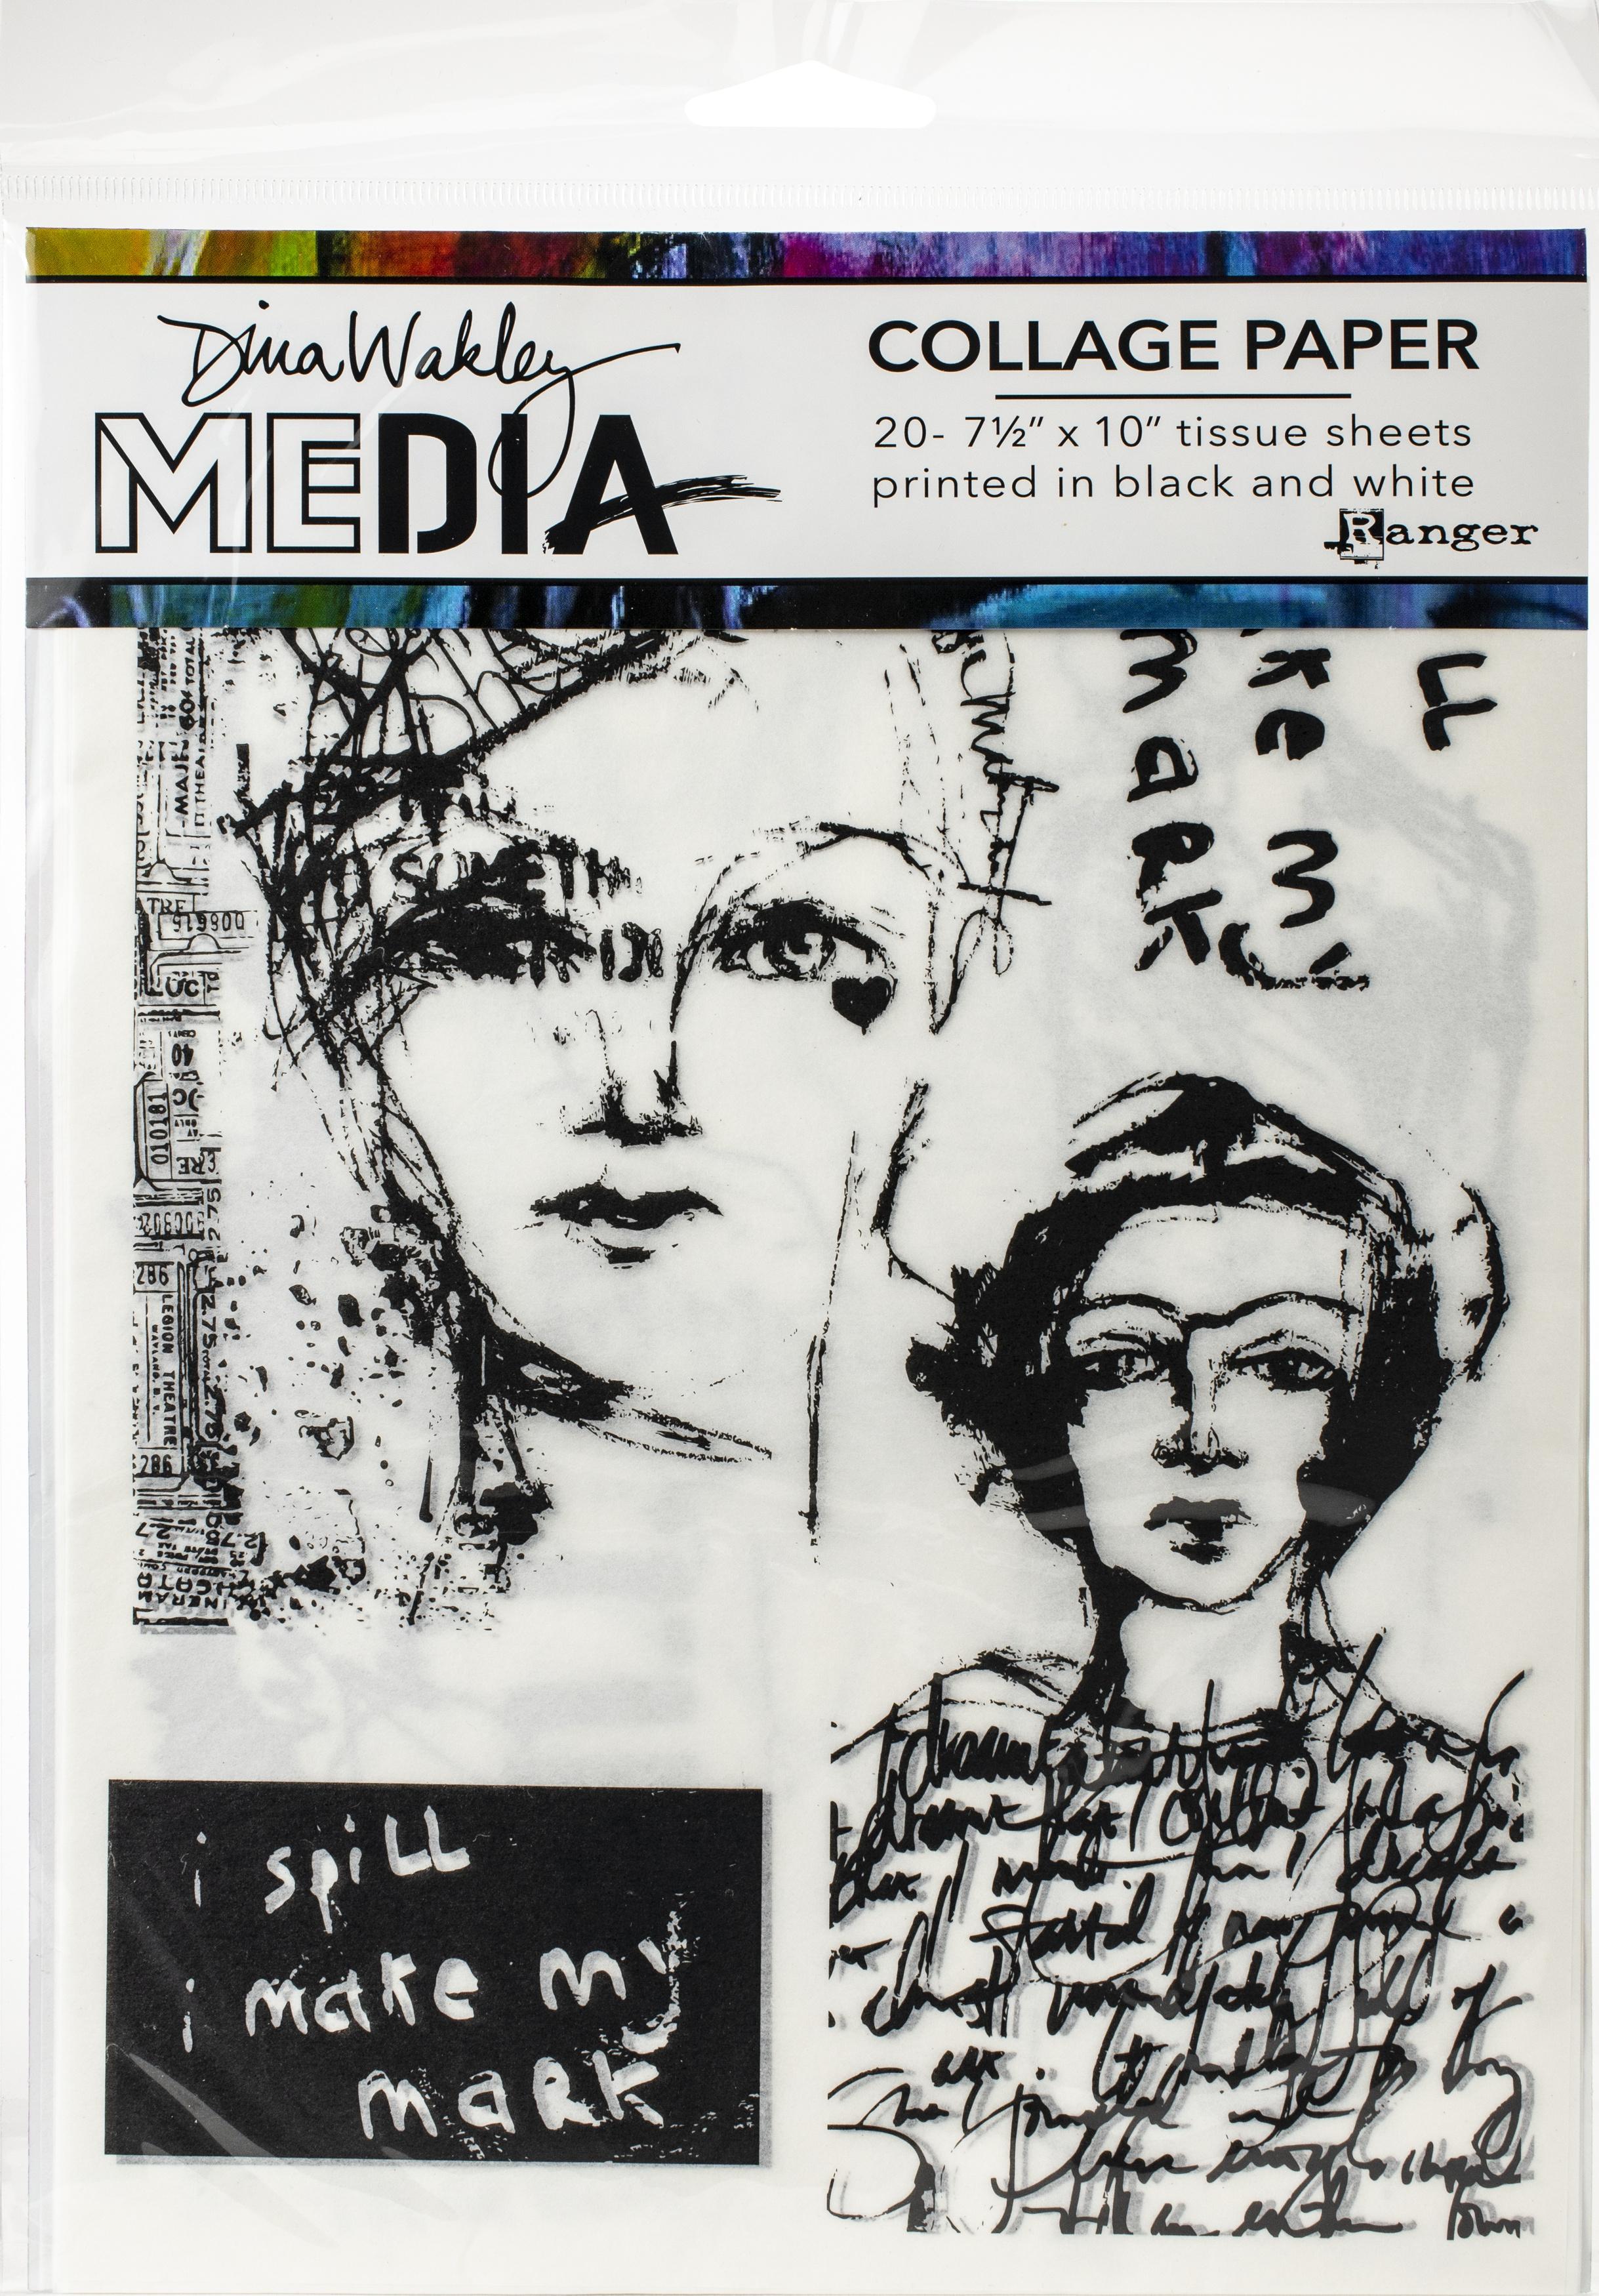 Dina Wakley Media Collage Tissue Paper 7.5X10 20/Pkg-Vintage & Sketches